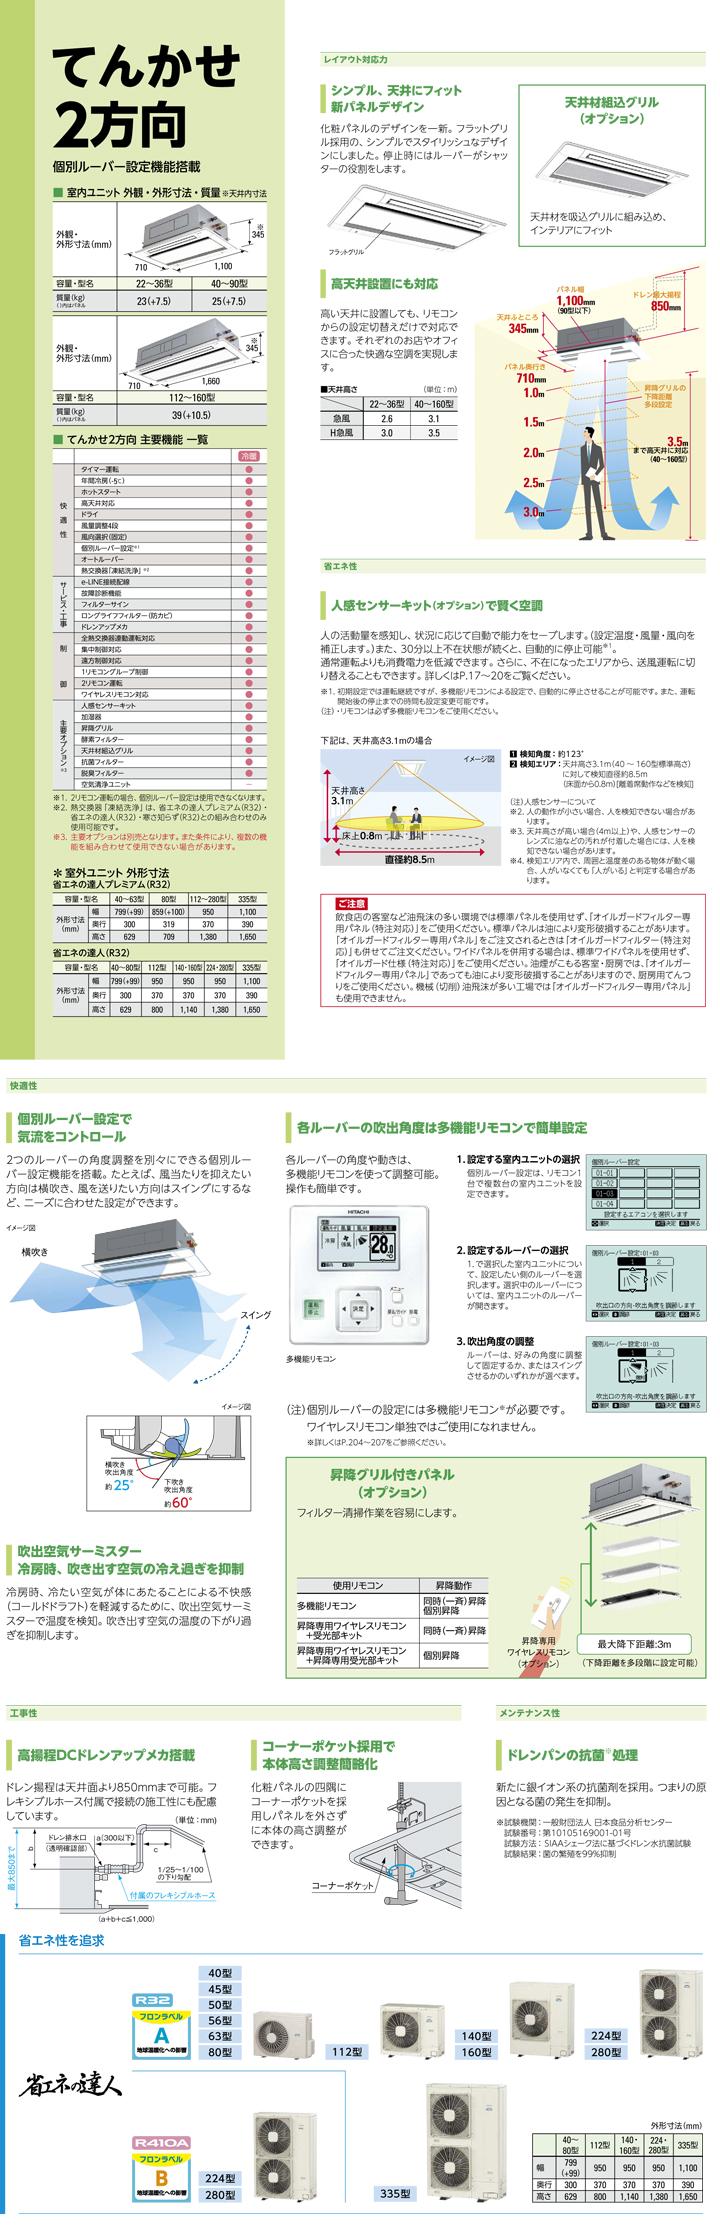 RCID-GP80RSHJ5カタログ